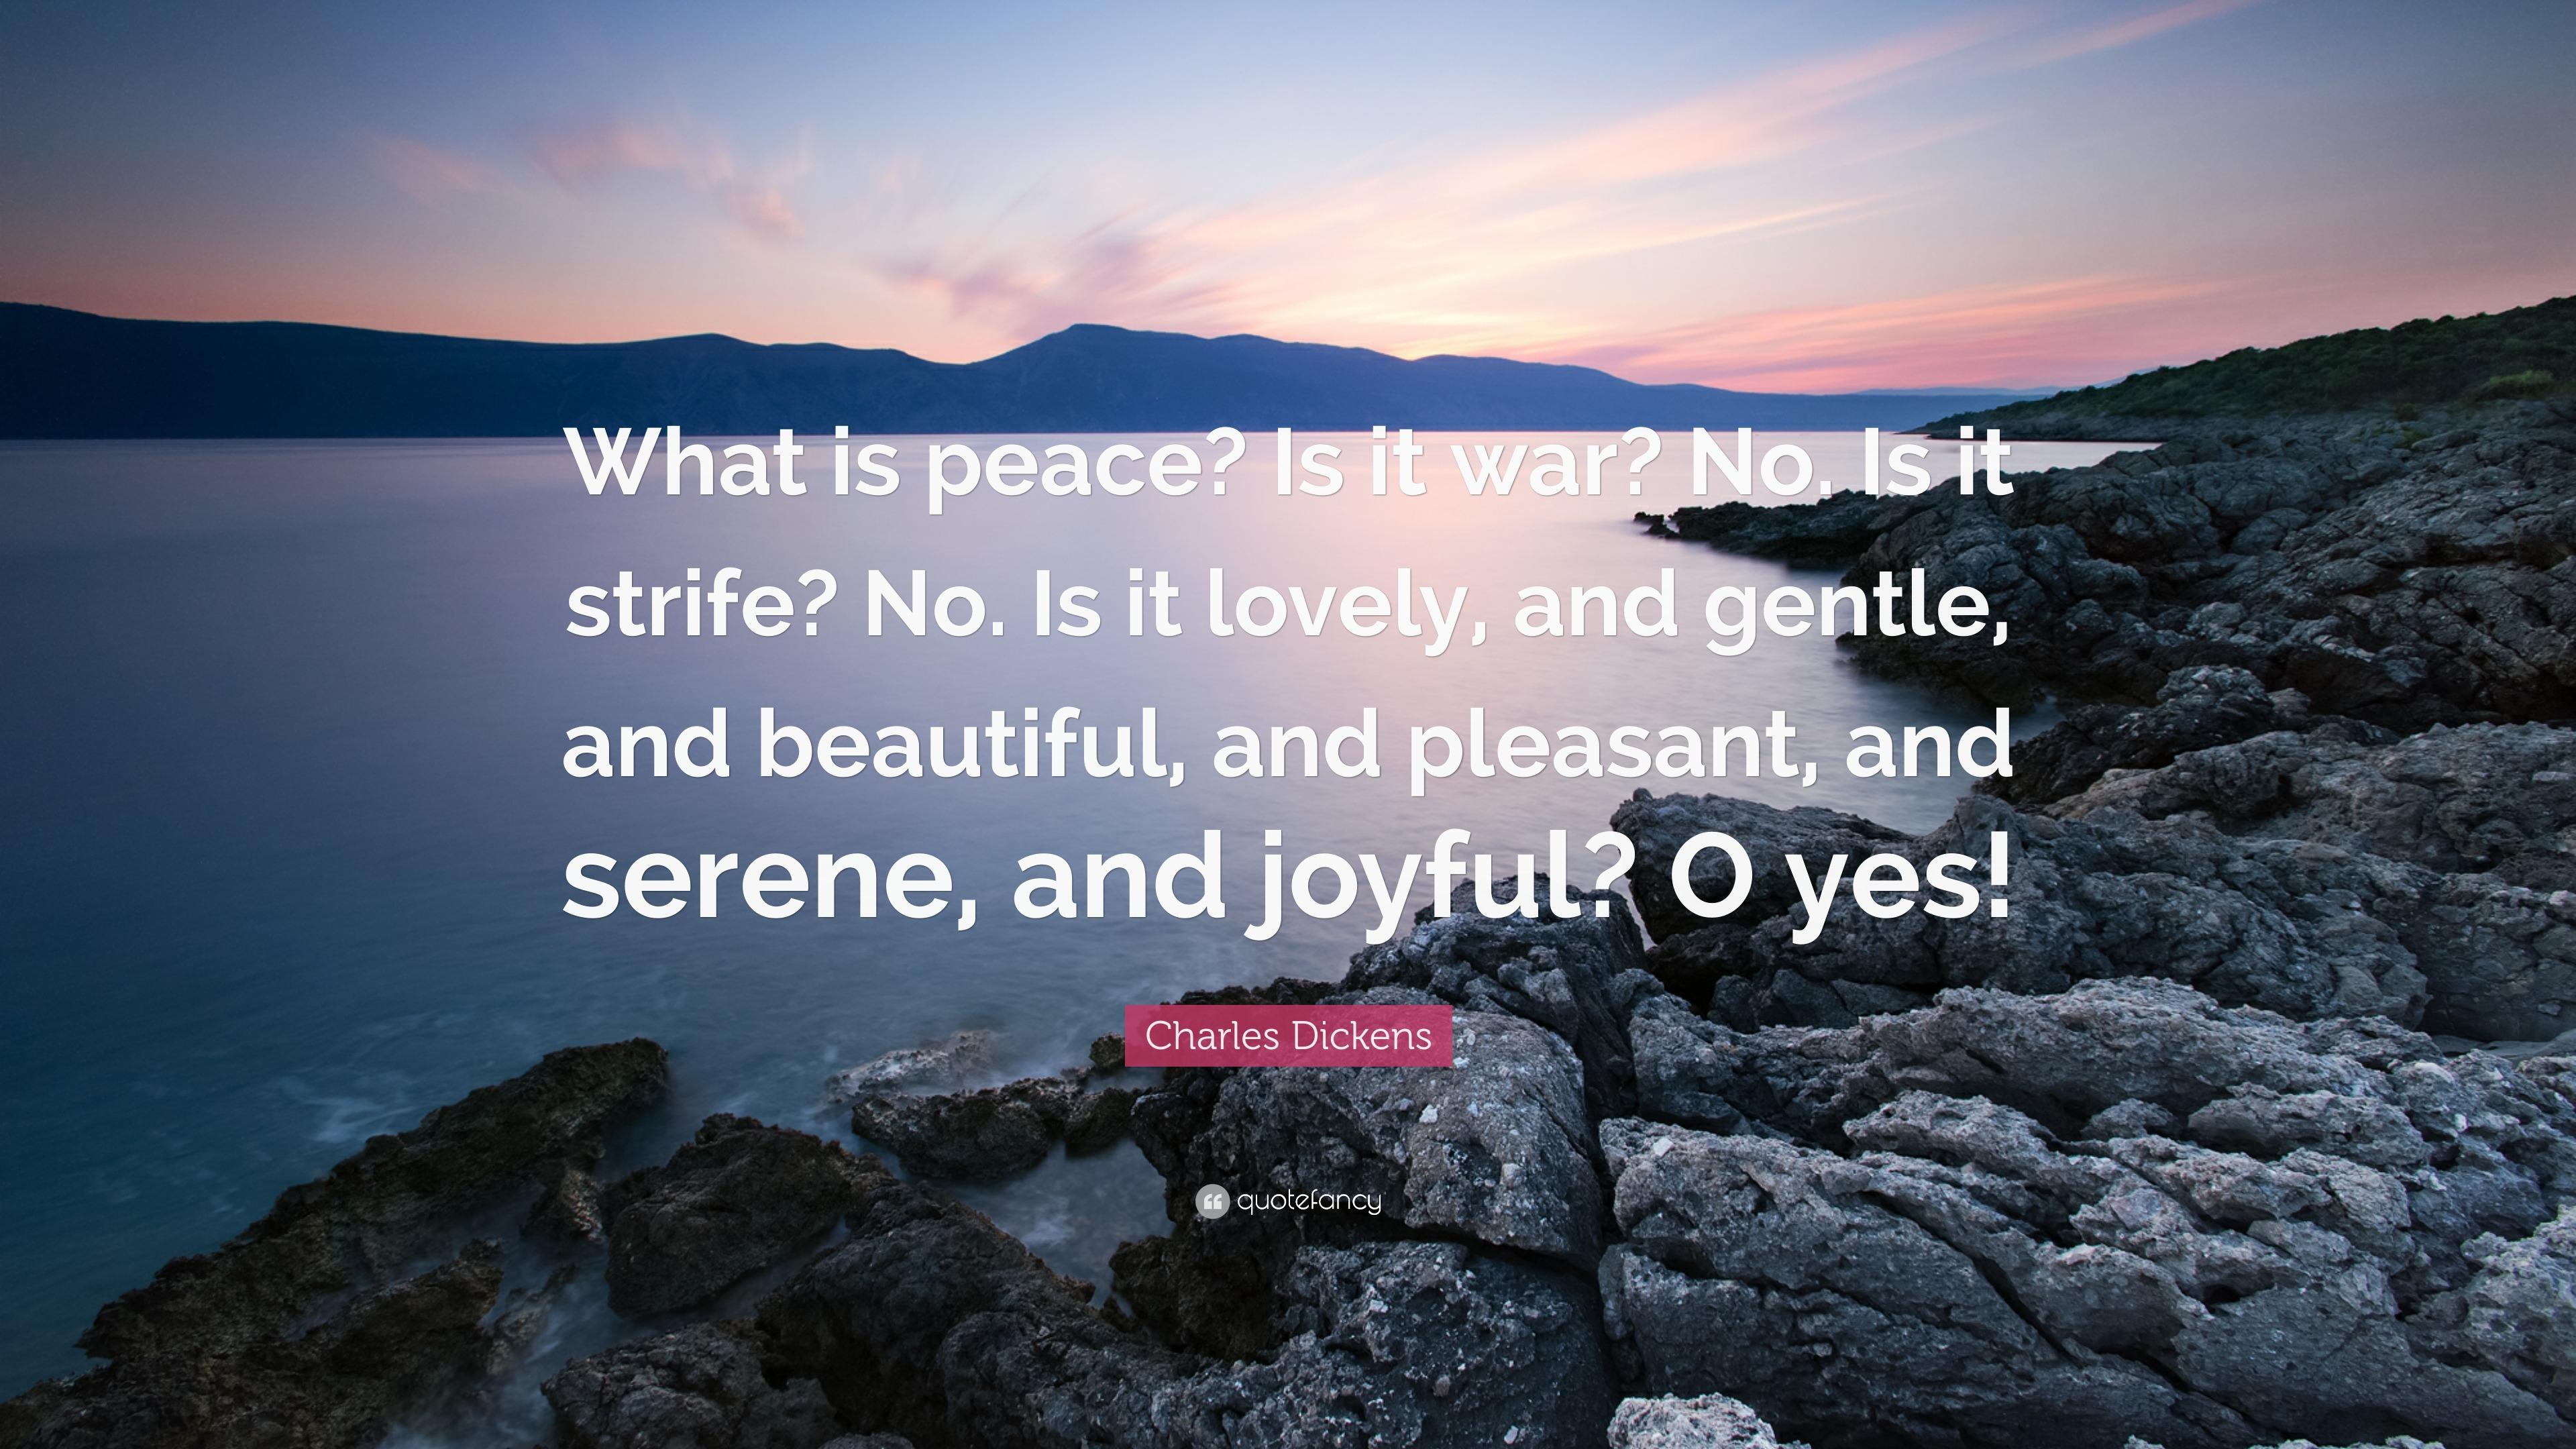 peace is beautiful